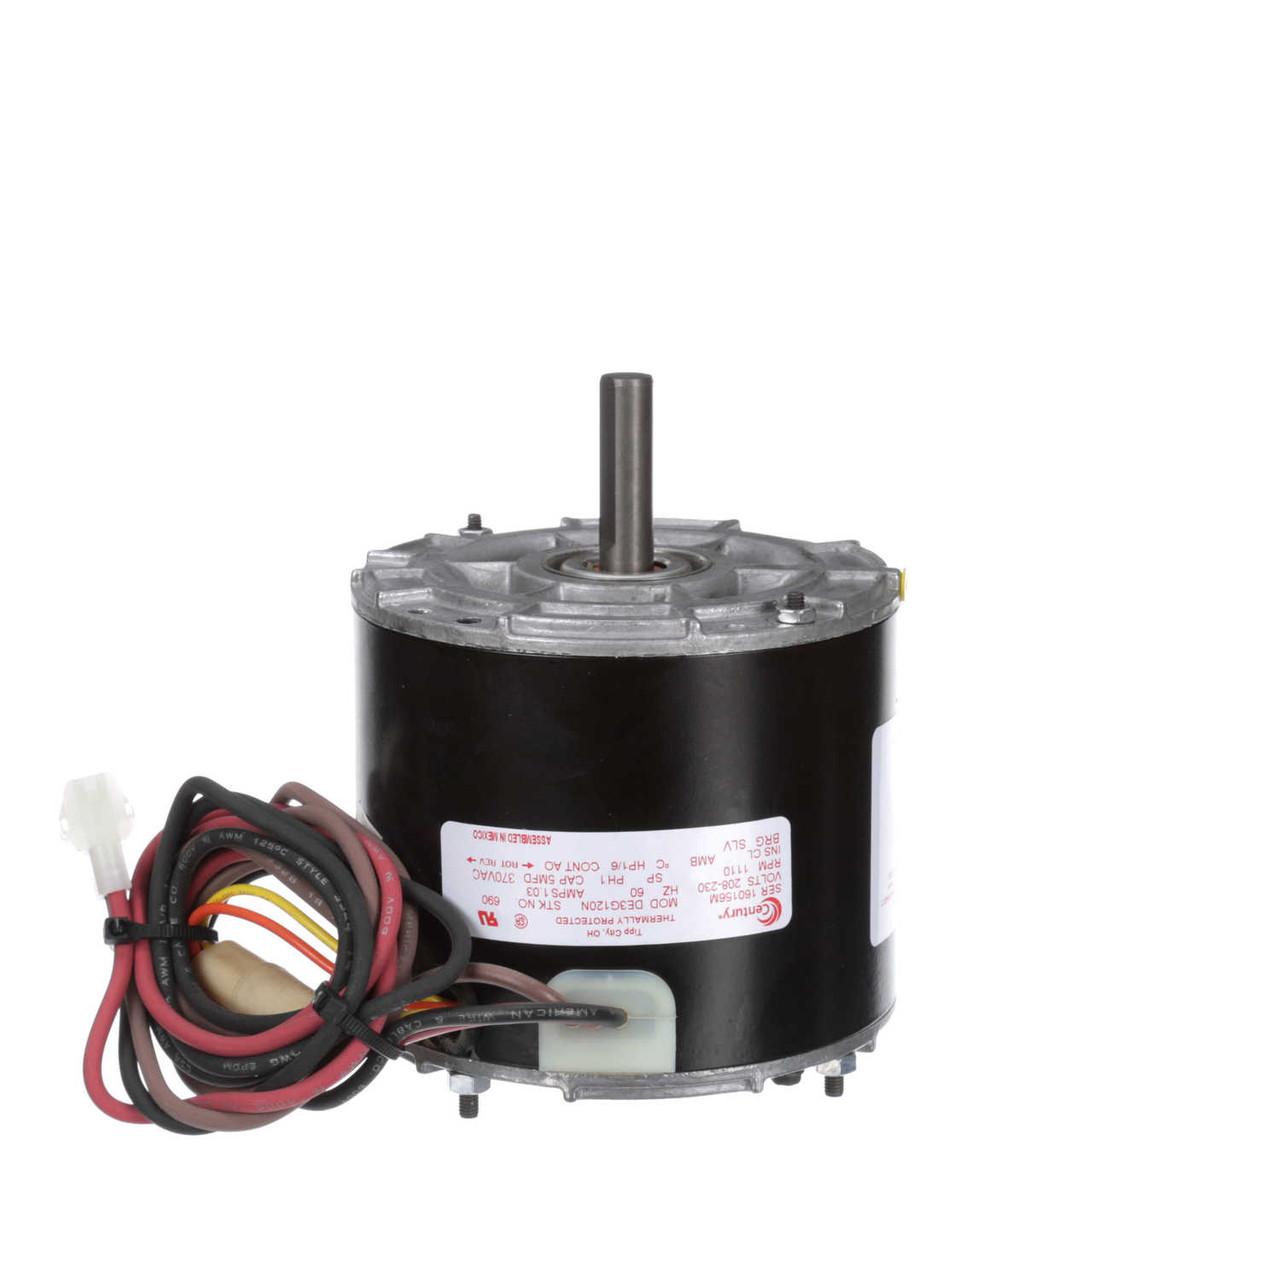 heil quaker icp replacement motor hq1052662un 1 6 hp 1110 rpm 208 230v century 690 [ 1280 x 1280 Pixel ]